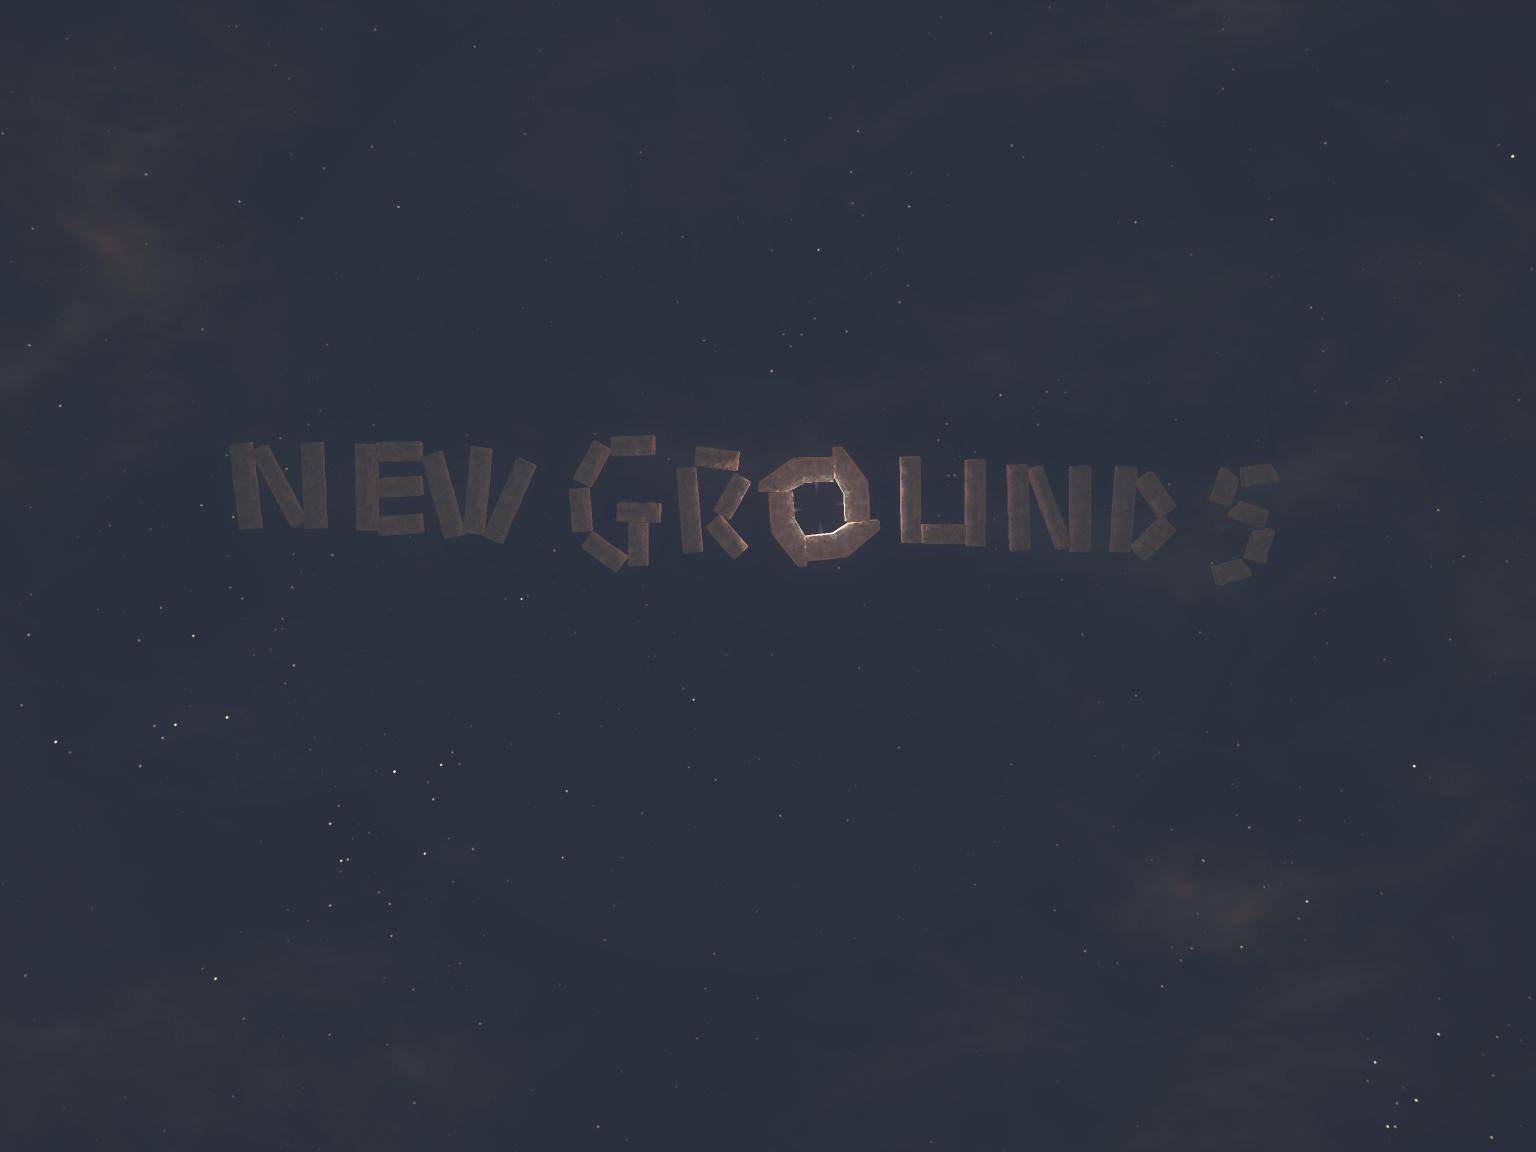 Halo 3 newgrounds